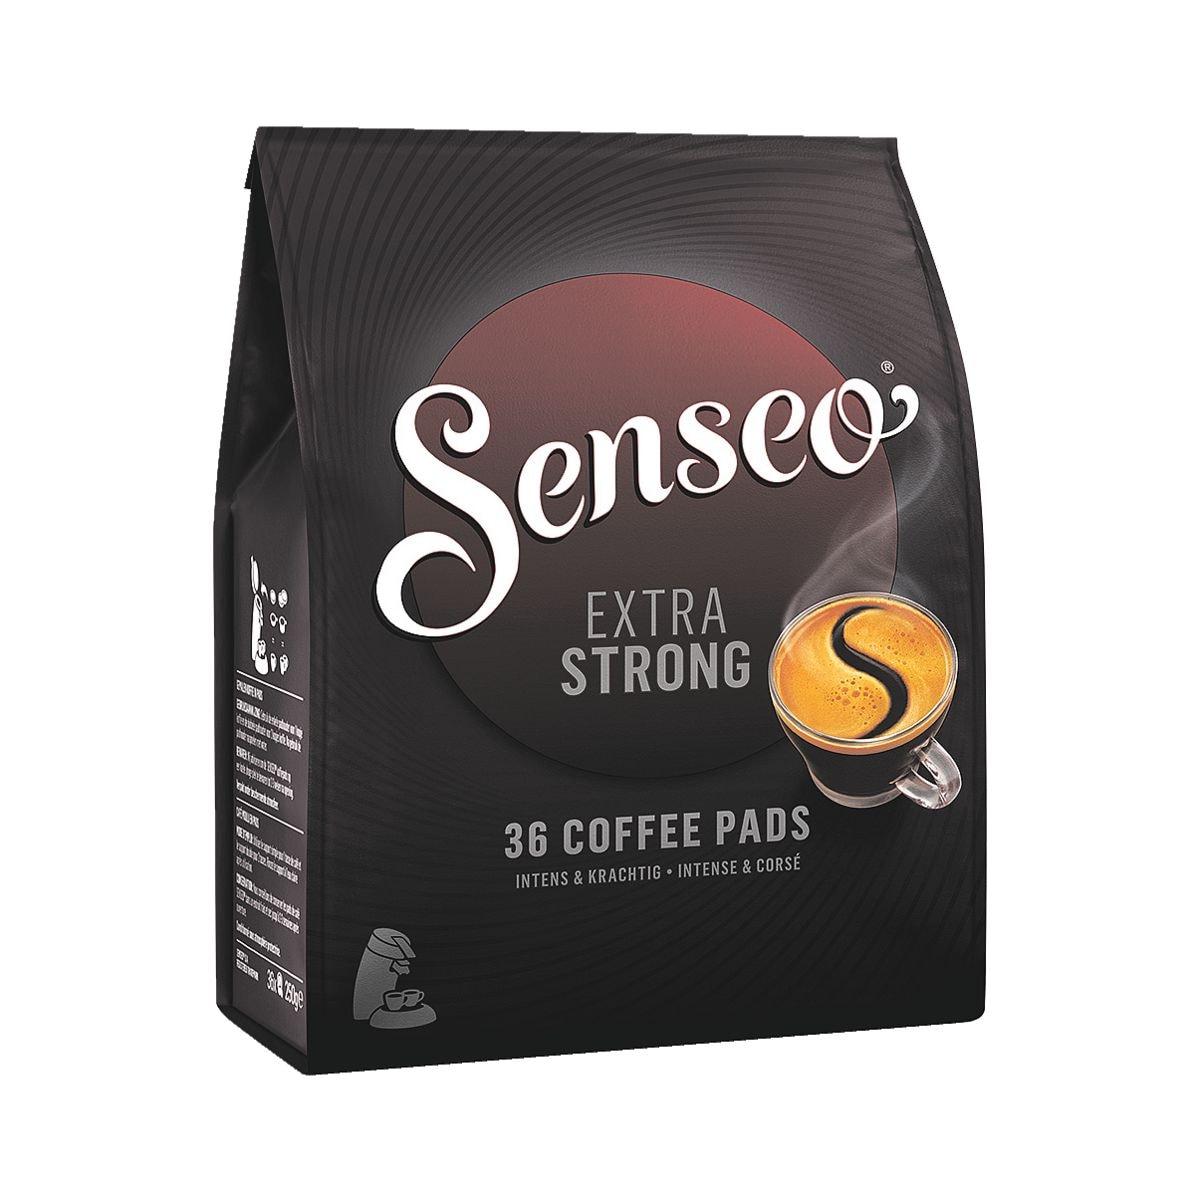 Senseo Pads de café « Extra Strong »